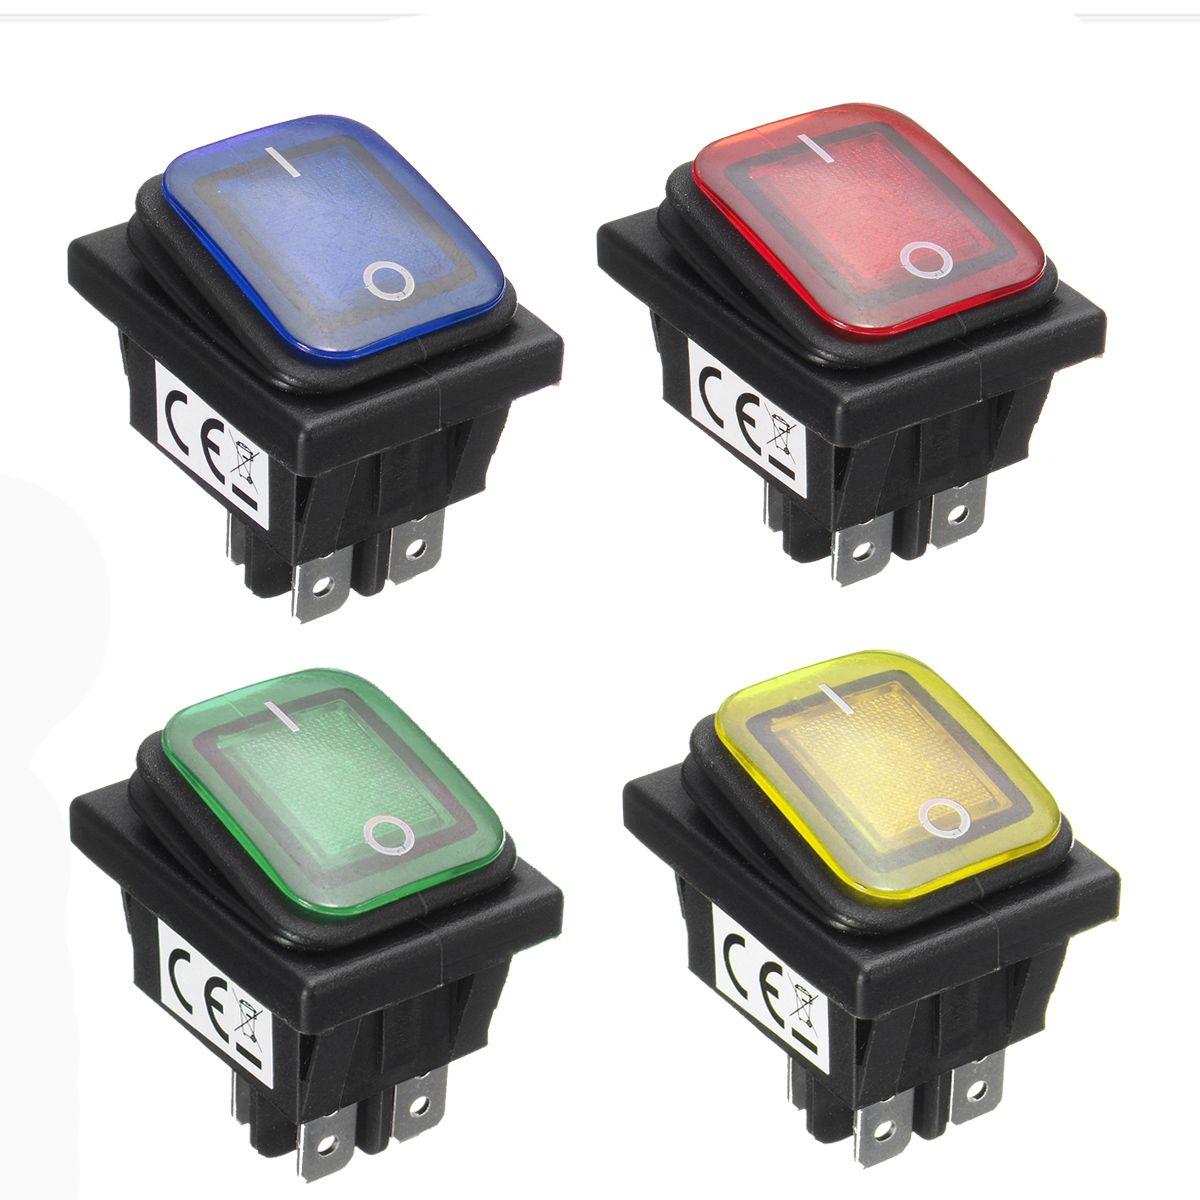 Waterproof 12V 16A Rocker Reset Single Toggle Switch With LED Light ...